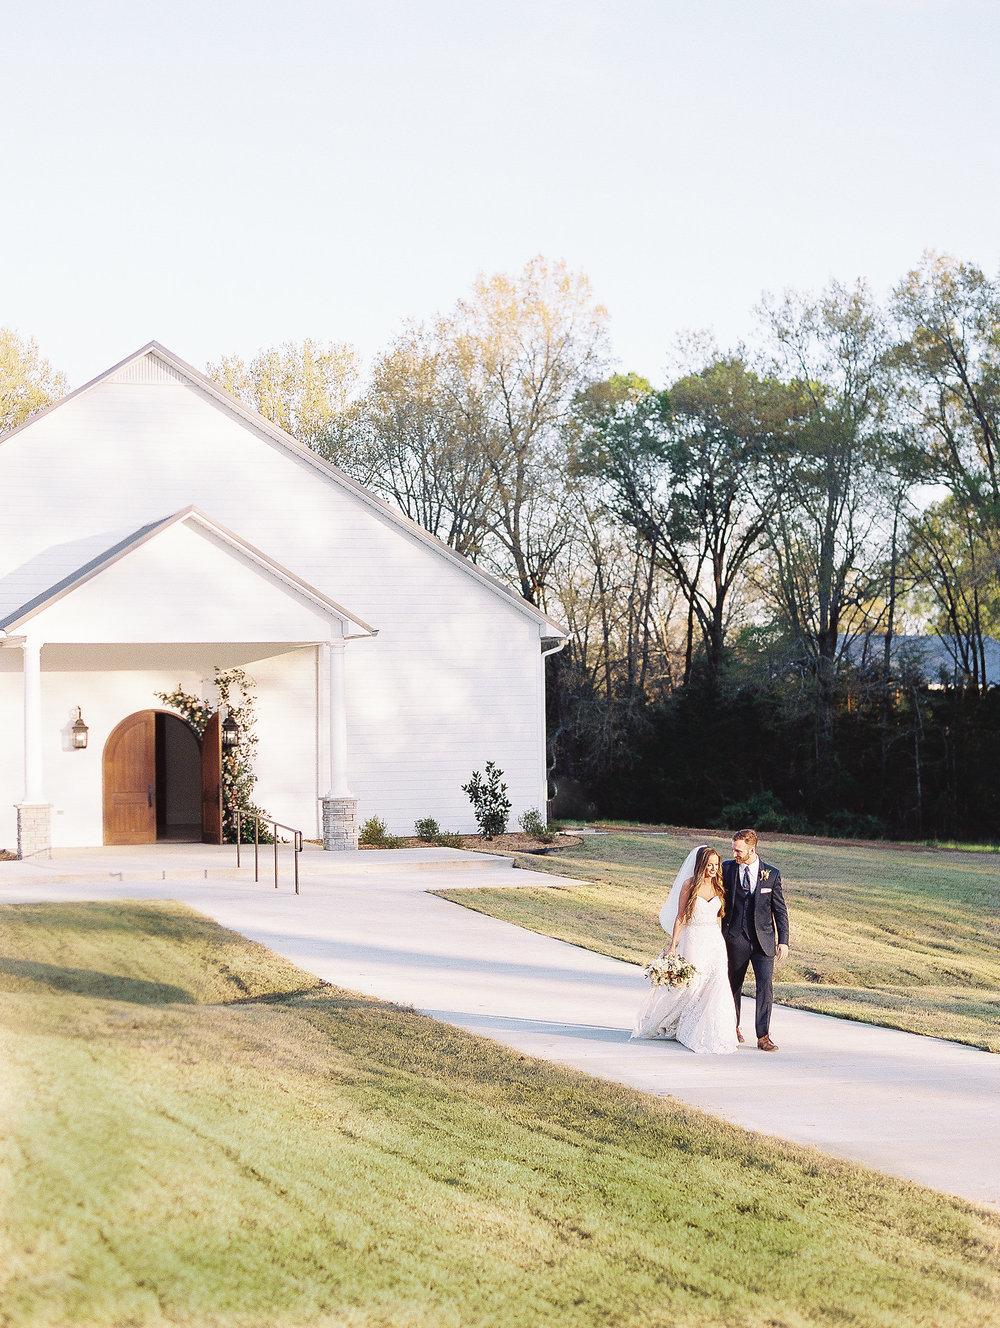 jessica-zimmerman-events-wedding-bride-groom.jpg